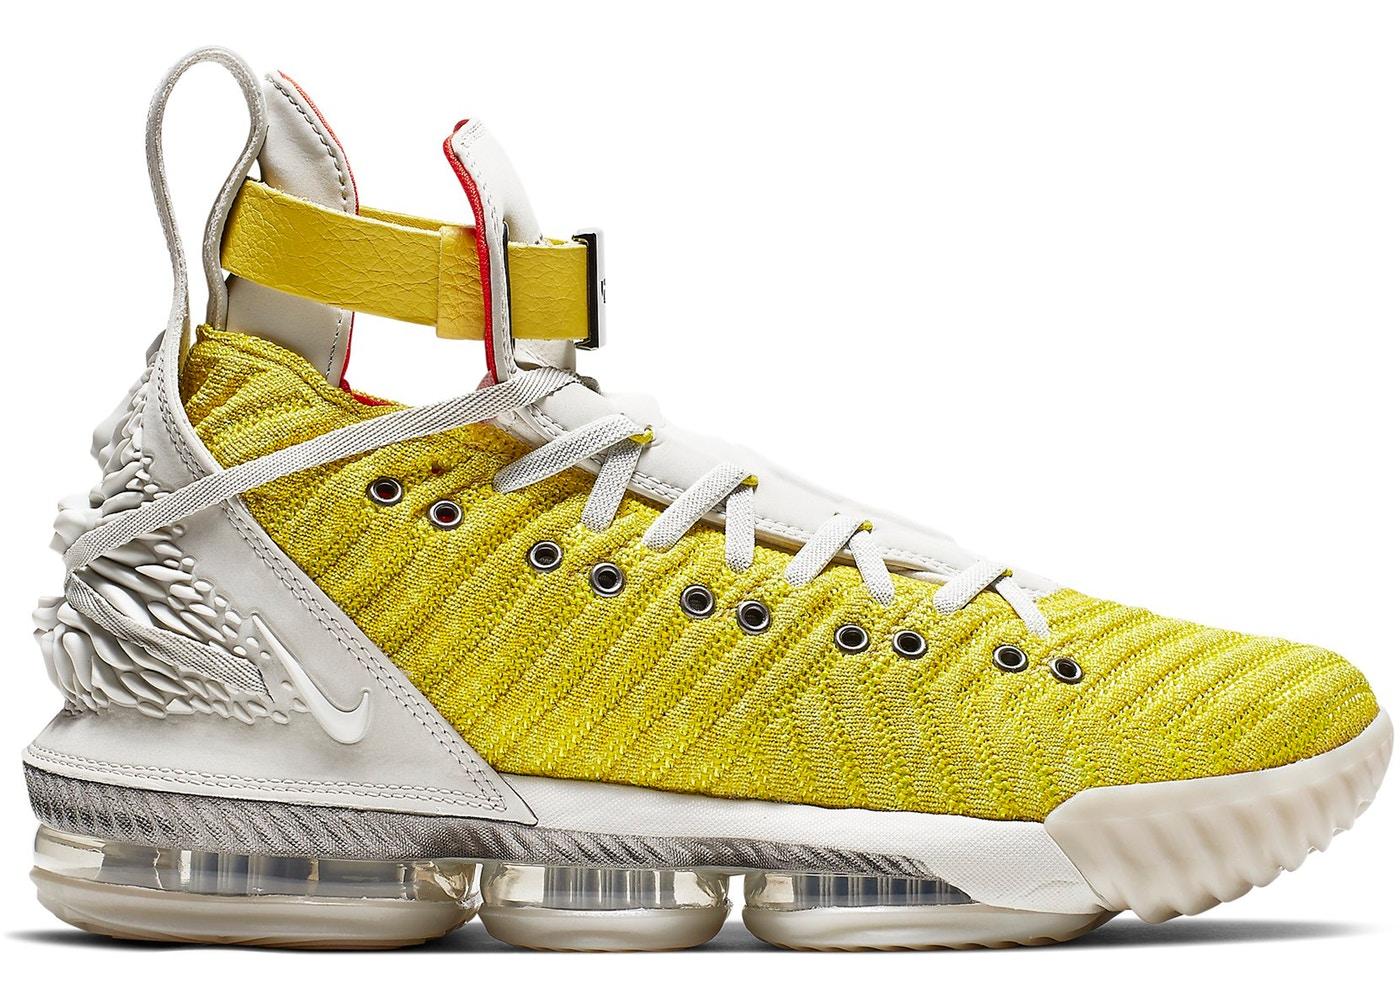 super popular 9d24f 210e7 Restock: Nike LeBron 16 HFR